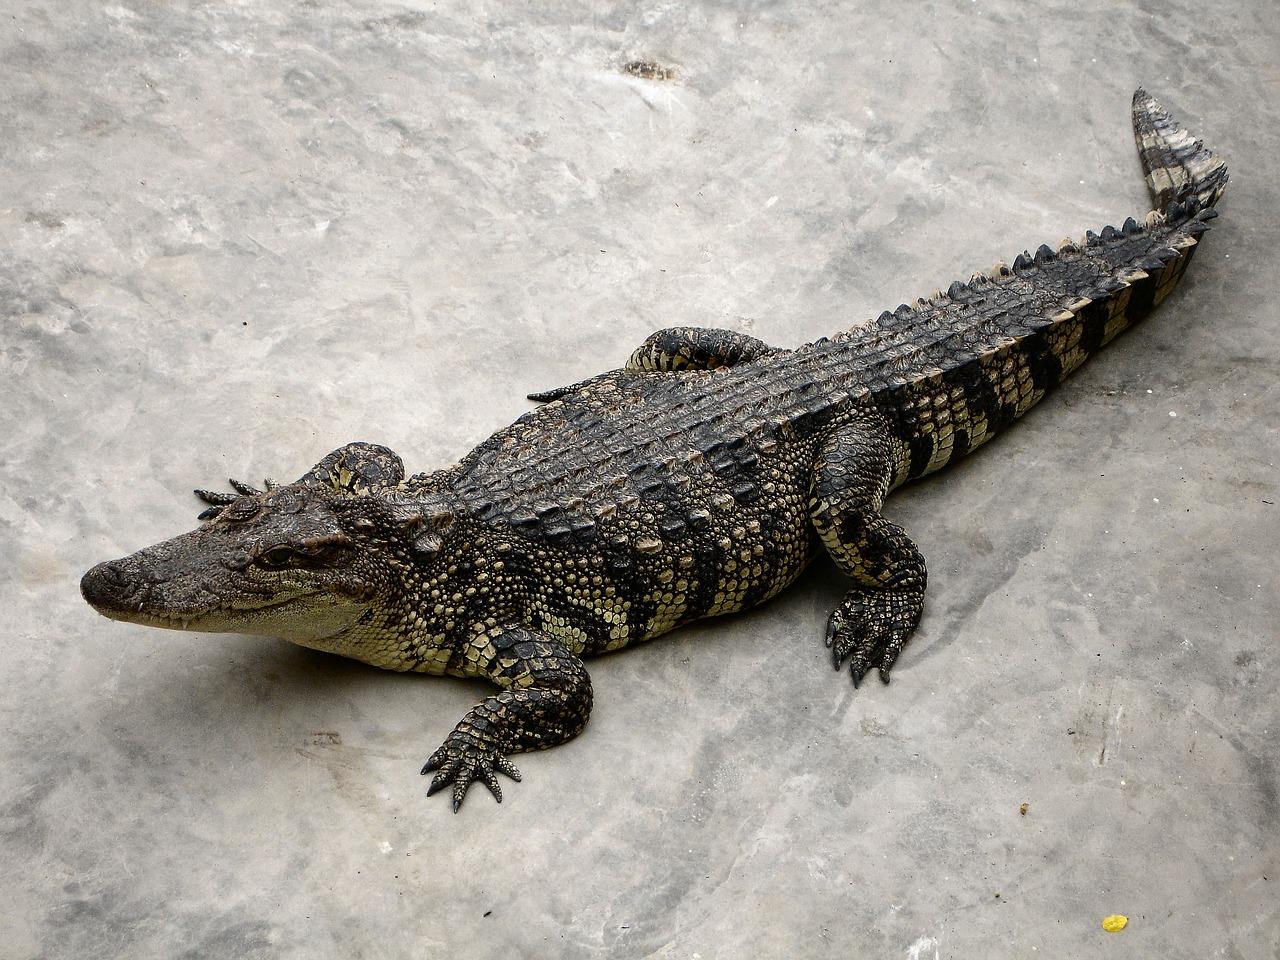 крокодил фото картинки часто встречаются вблизи